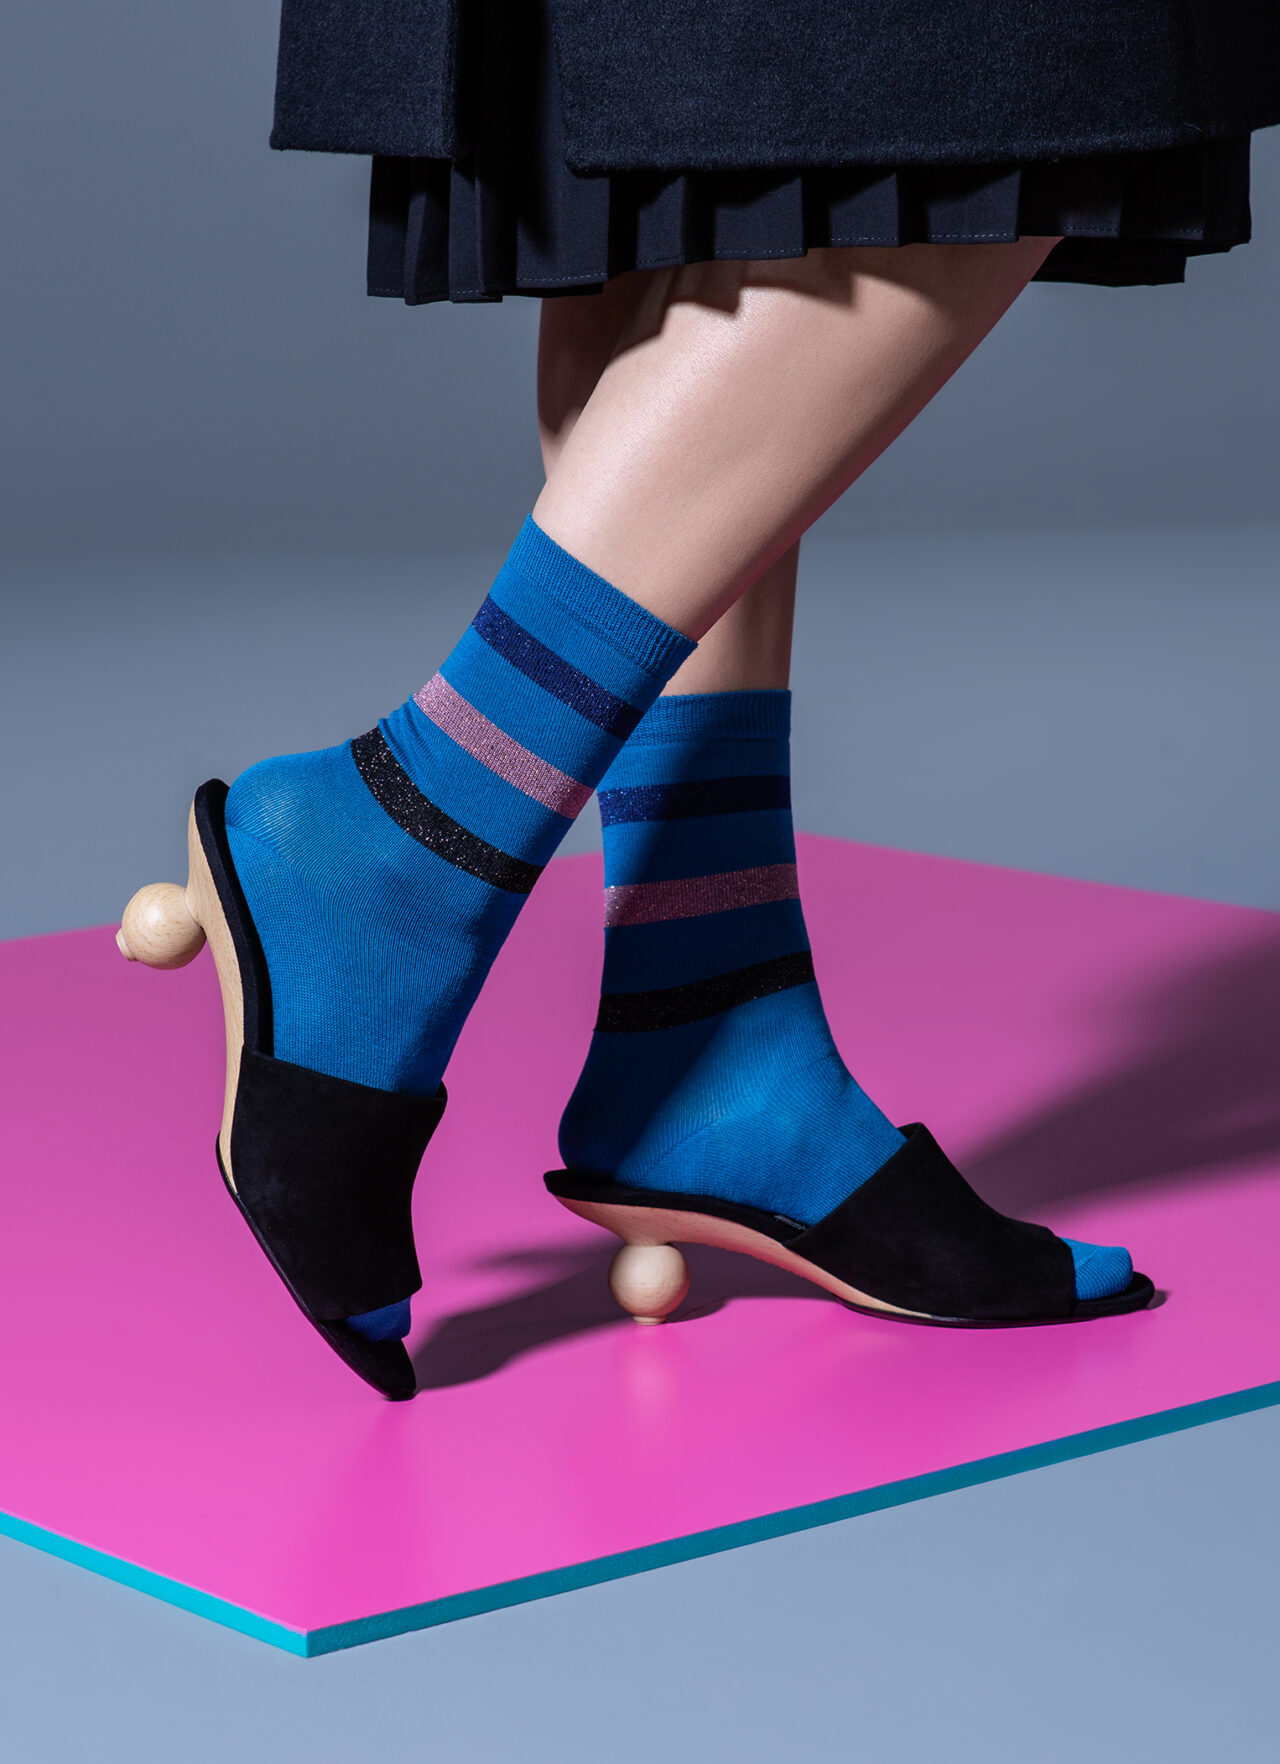 FW 19/20 Socks Campaign